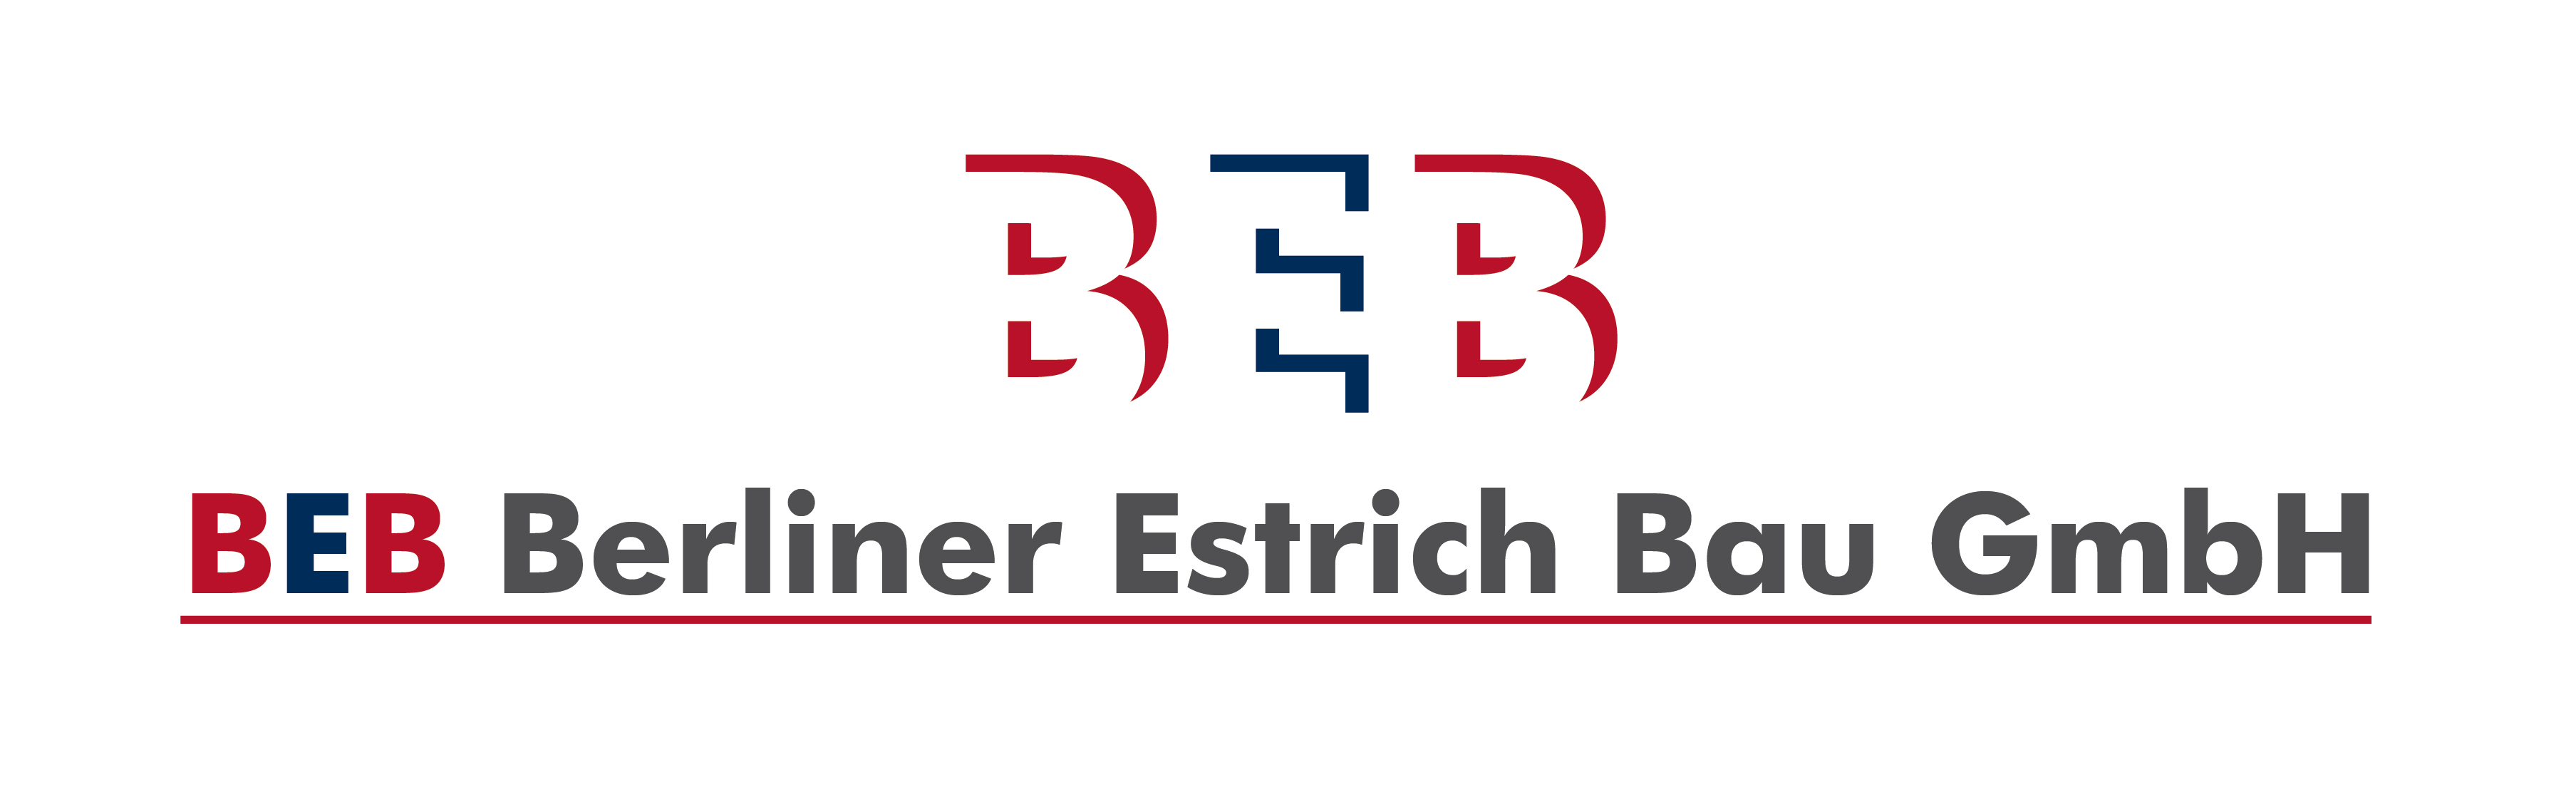 BEB Berliner Estrich Bau GmbH